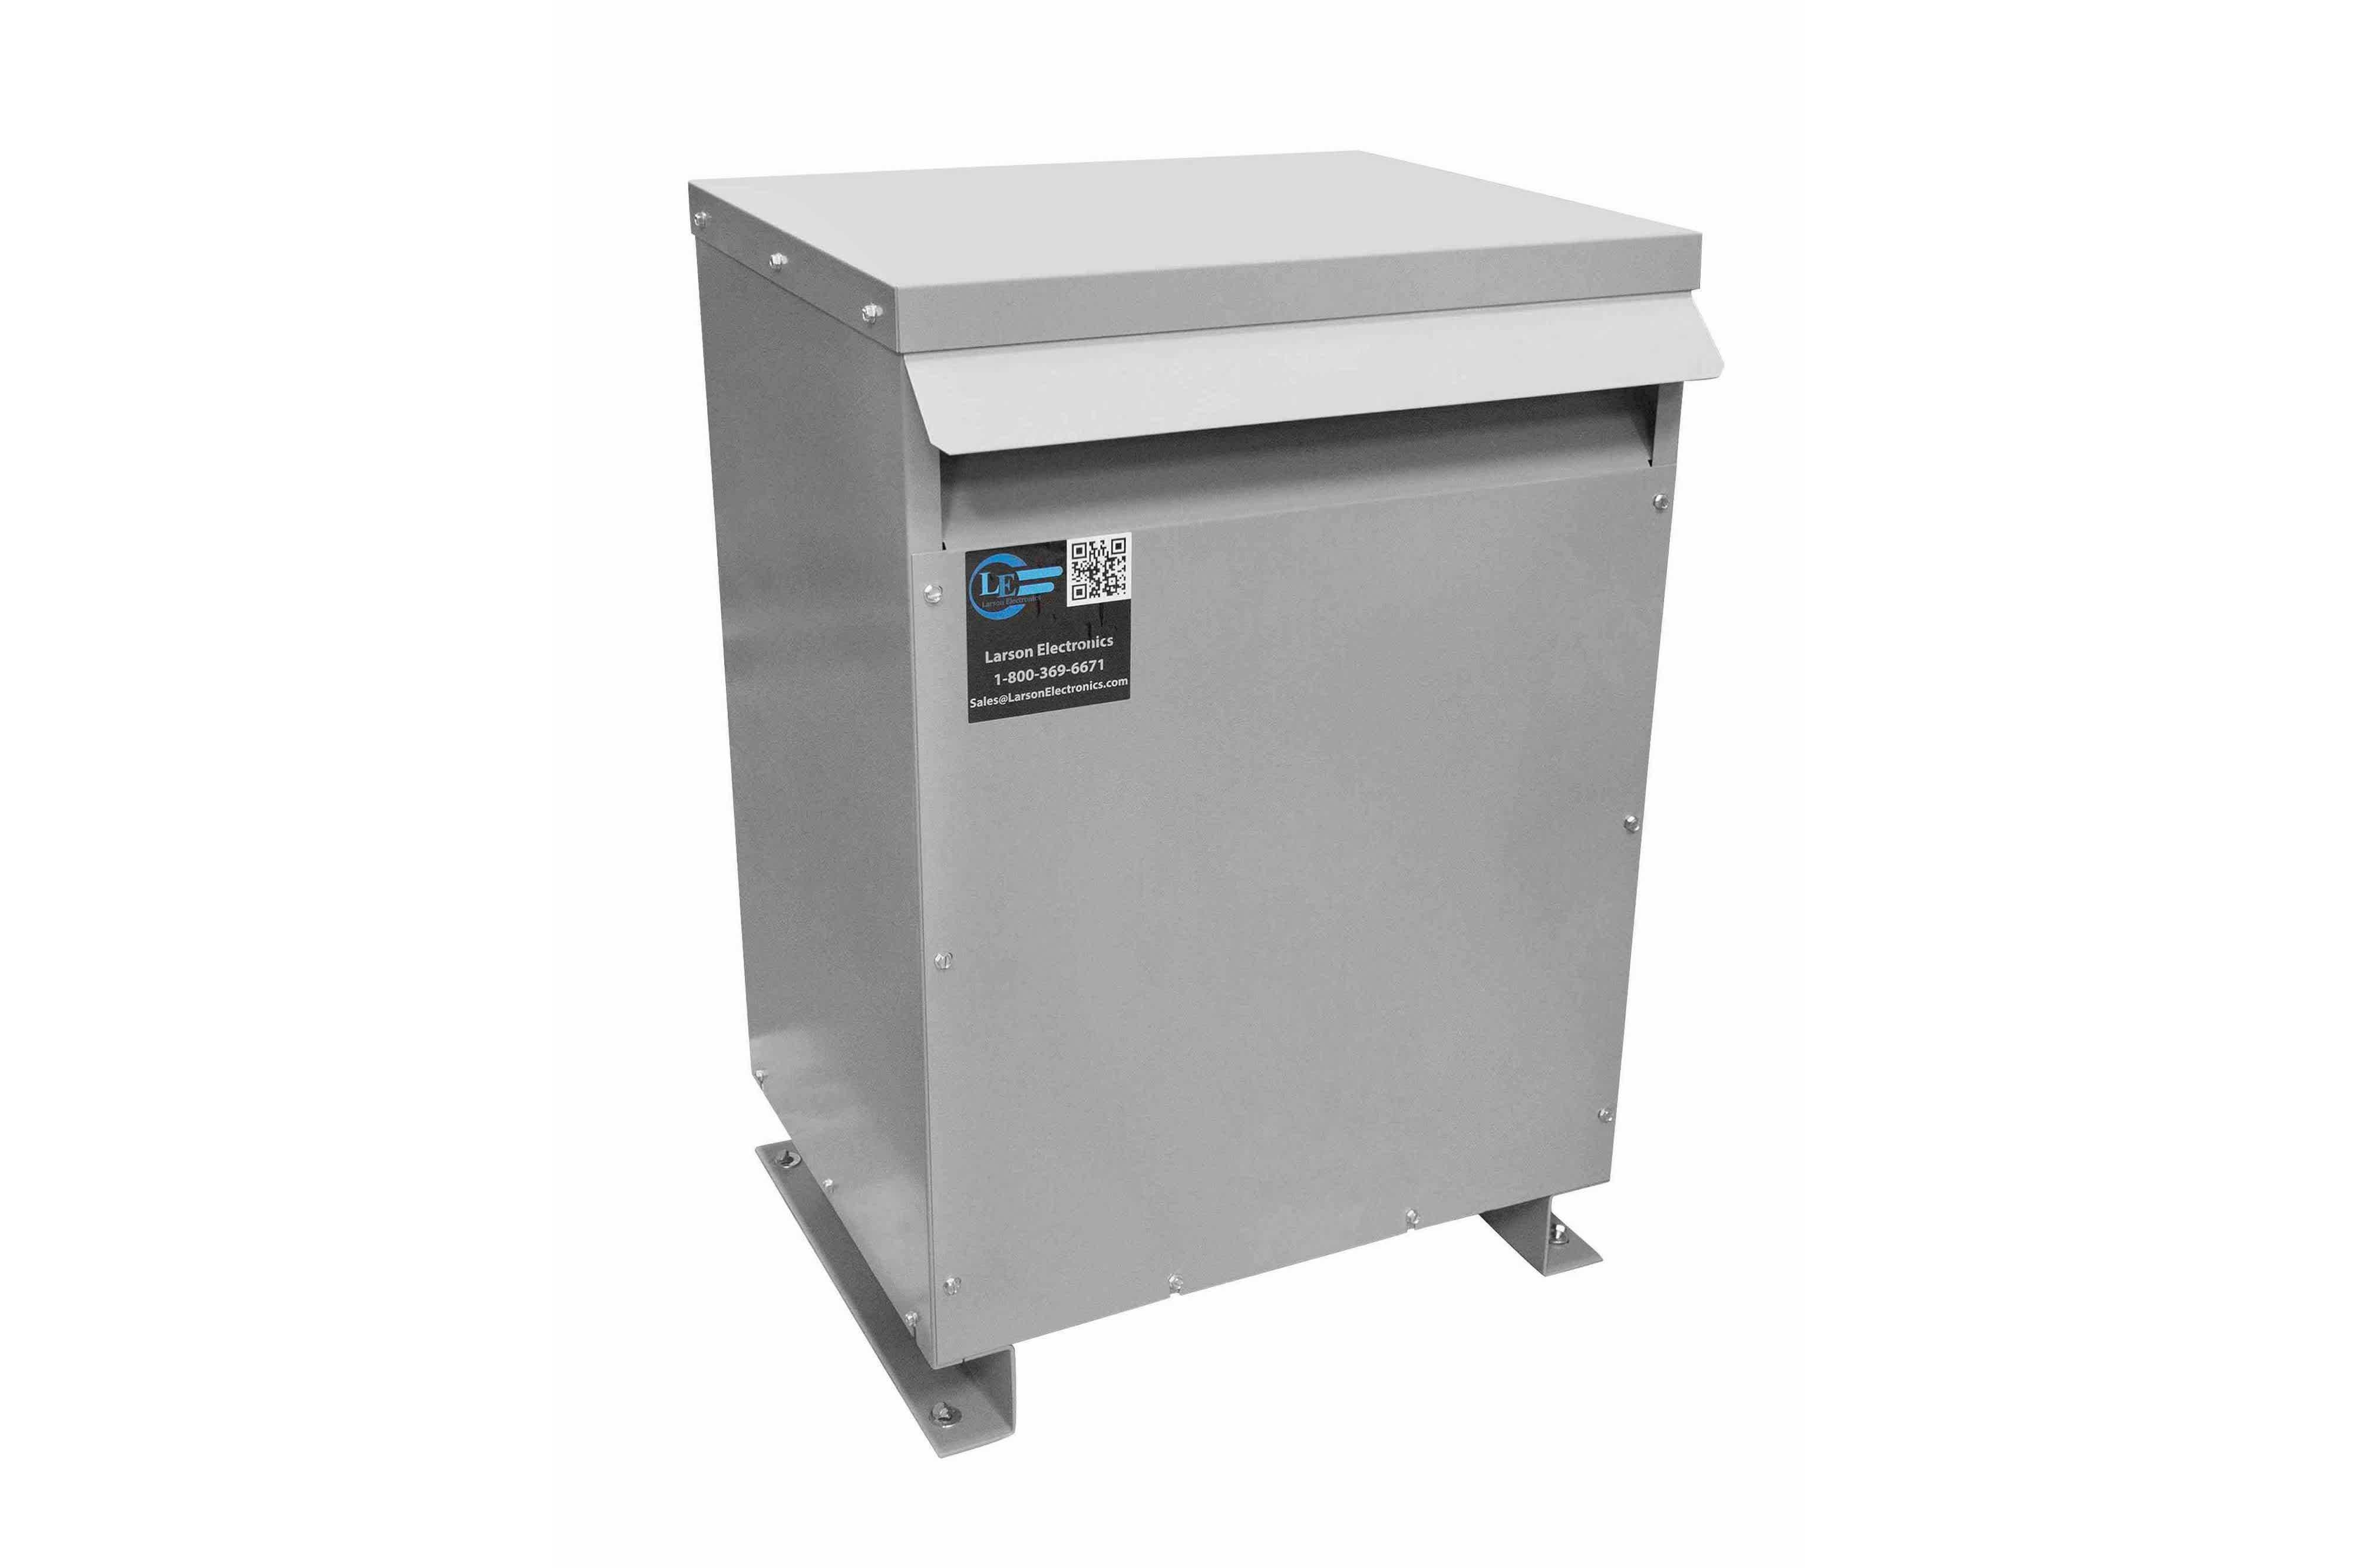 167 kVA 3PH Isolation Transformer, 208V Wye Primary, 240V/120 Delta Secondary, N3R, Ventilated, 60 Hz